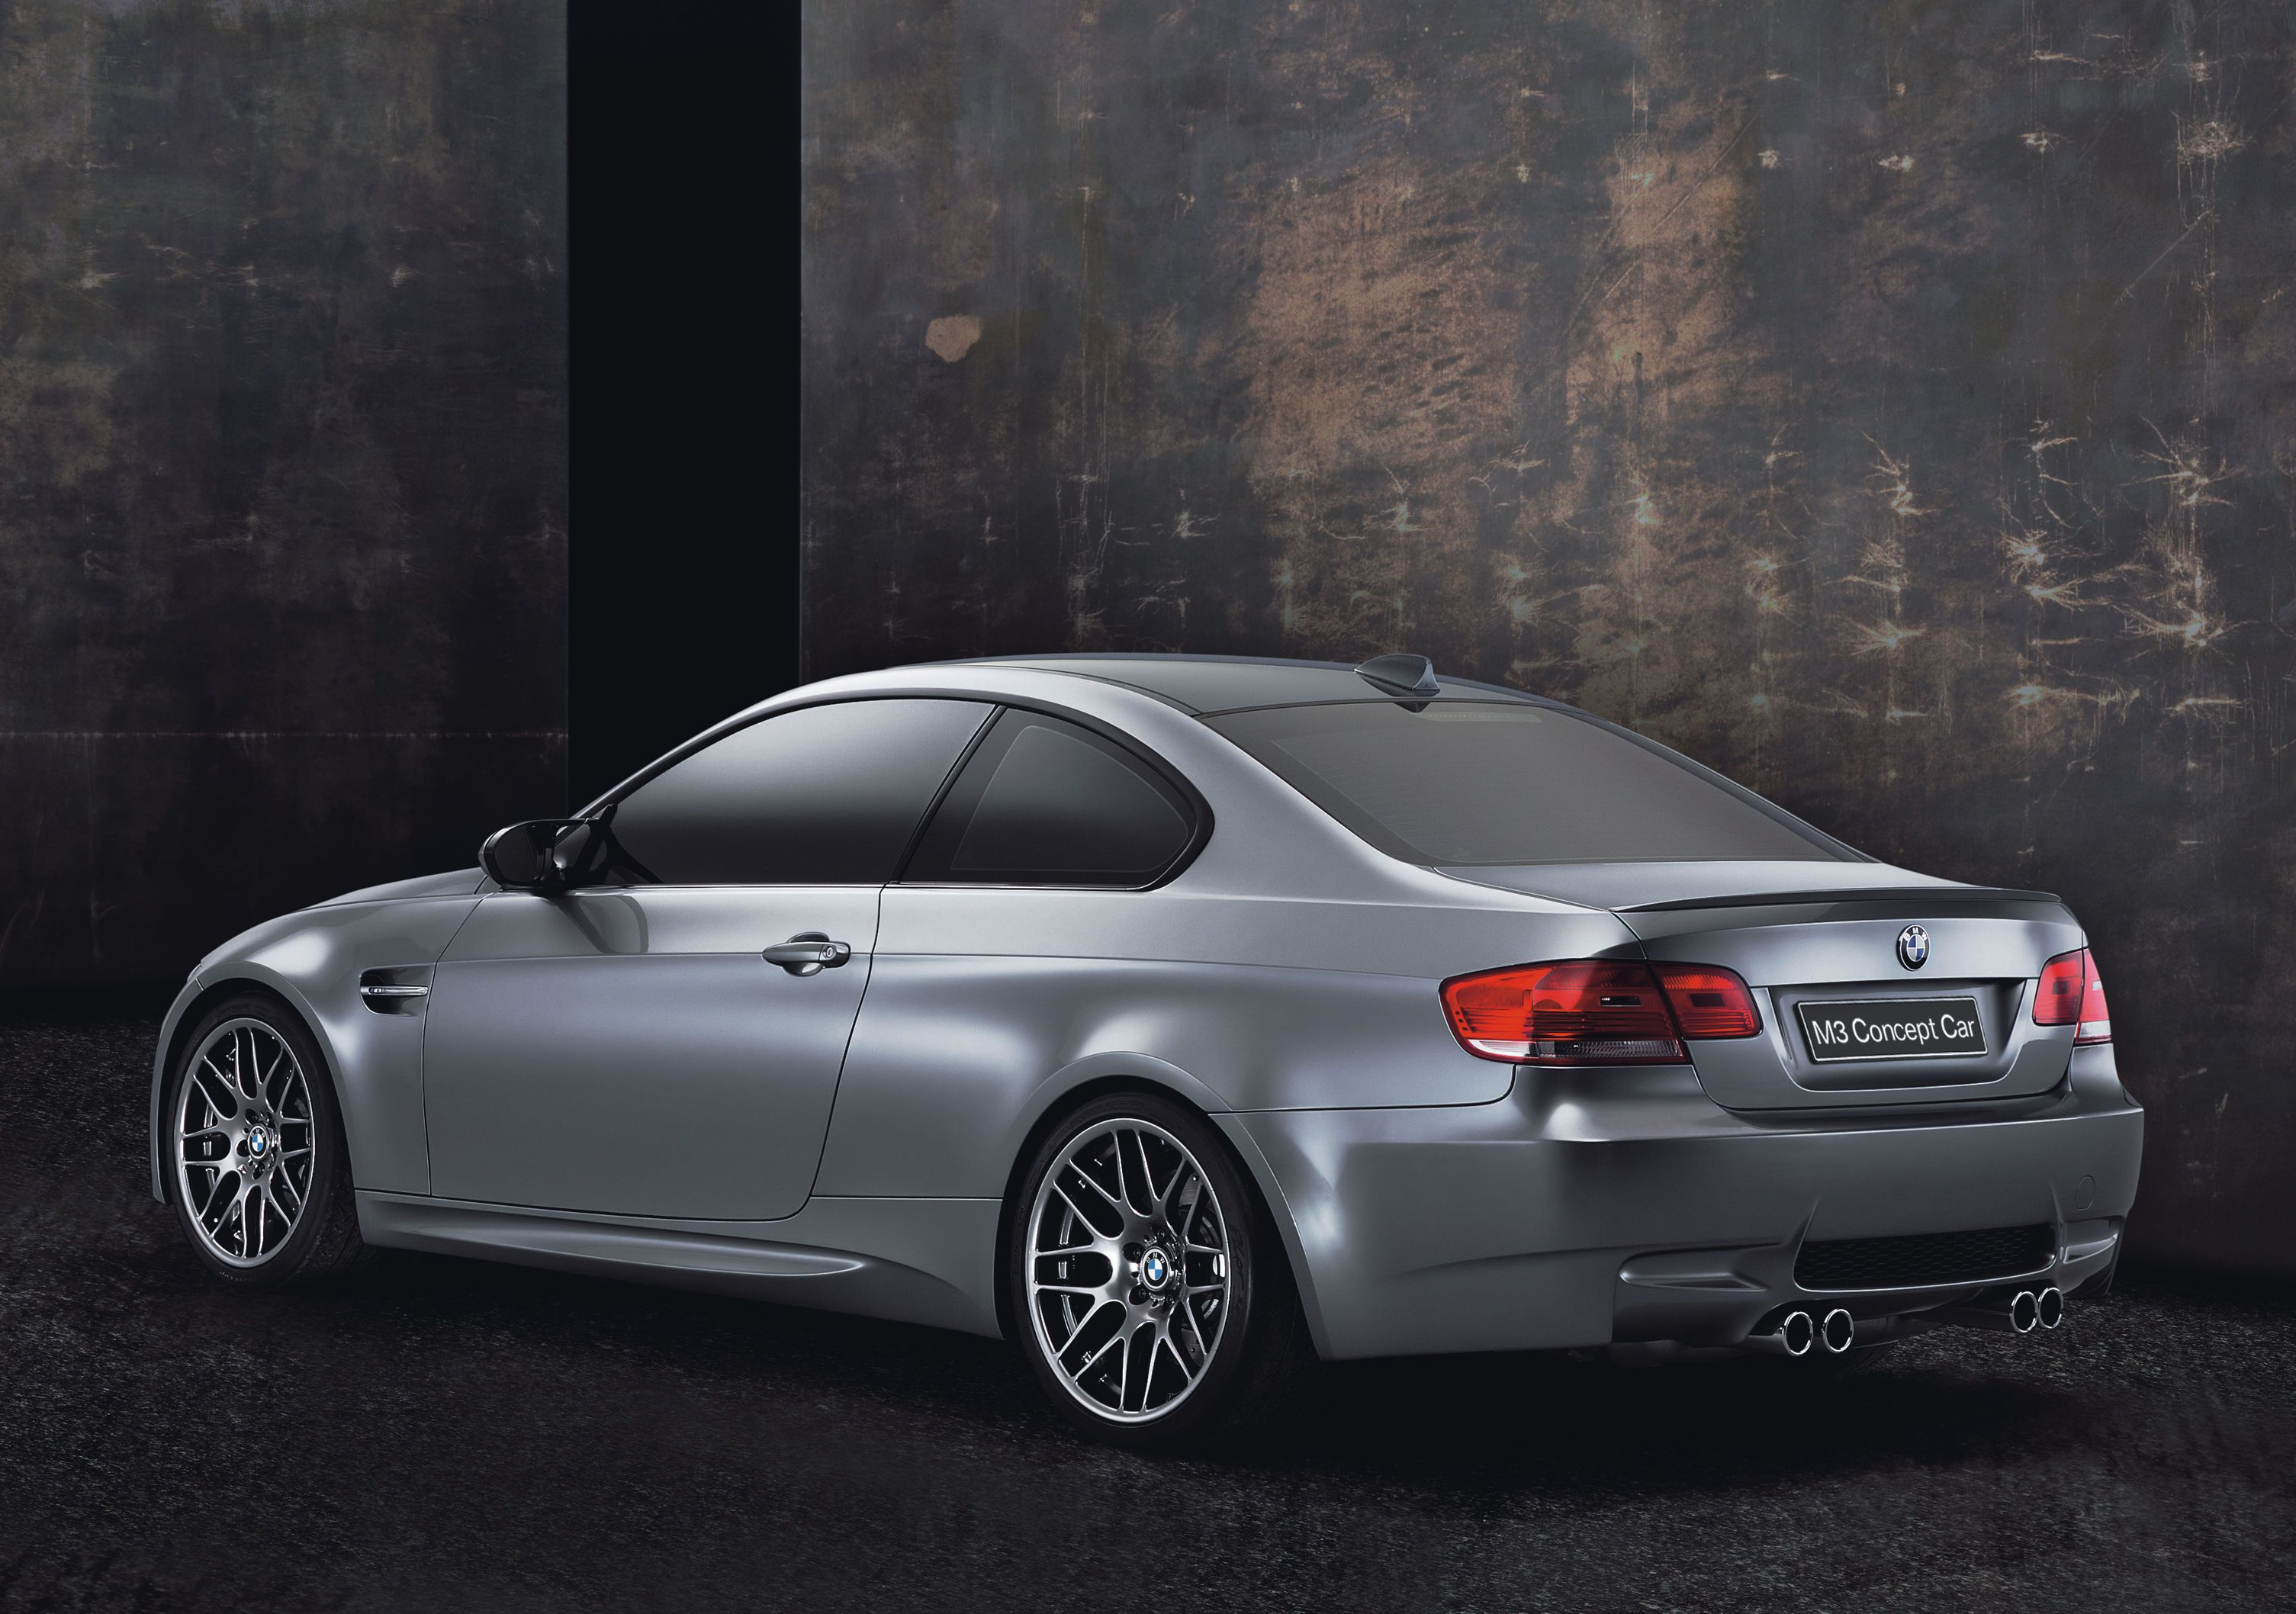 2007 BMW M3 concept | Car blings | Pinterest | BMW M3, BMW and Bmw ...